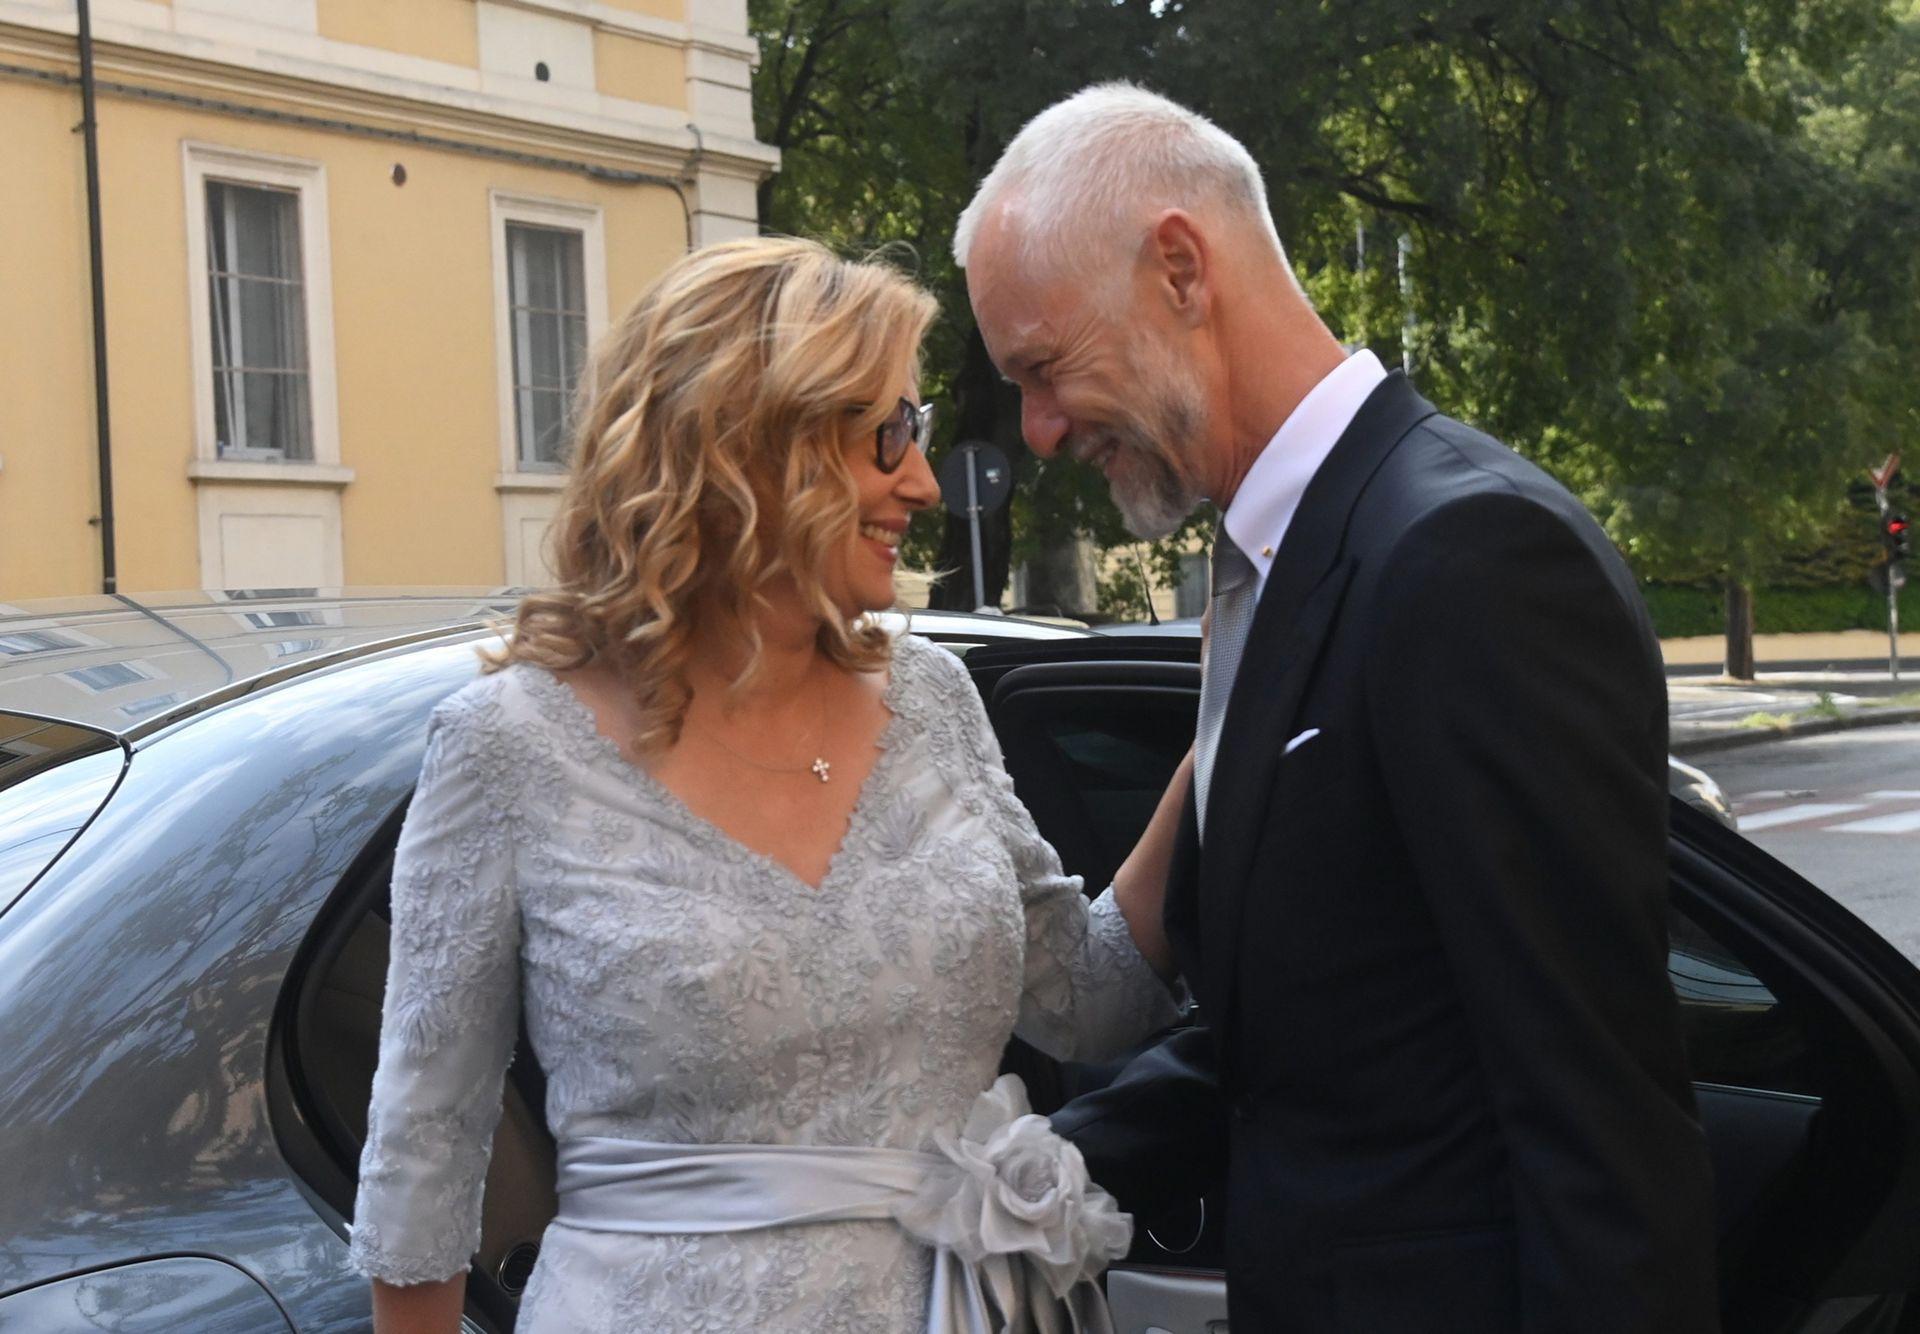 nicoletta-mantovani-boda.jpg